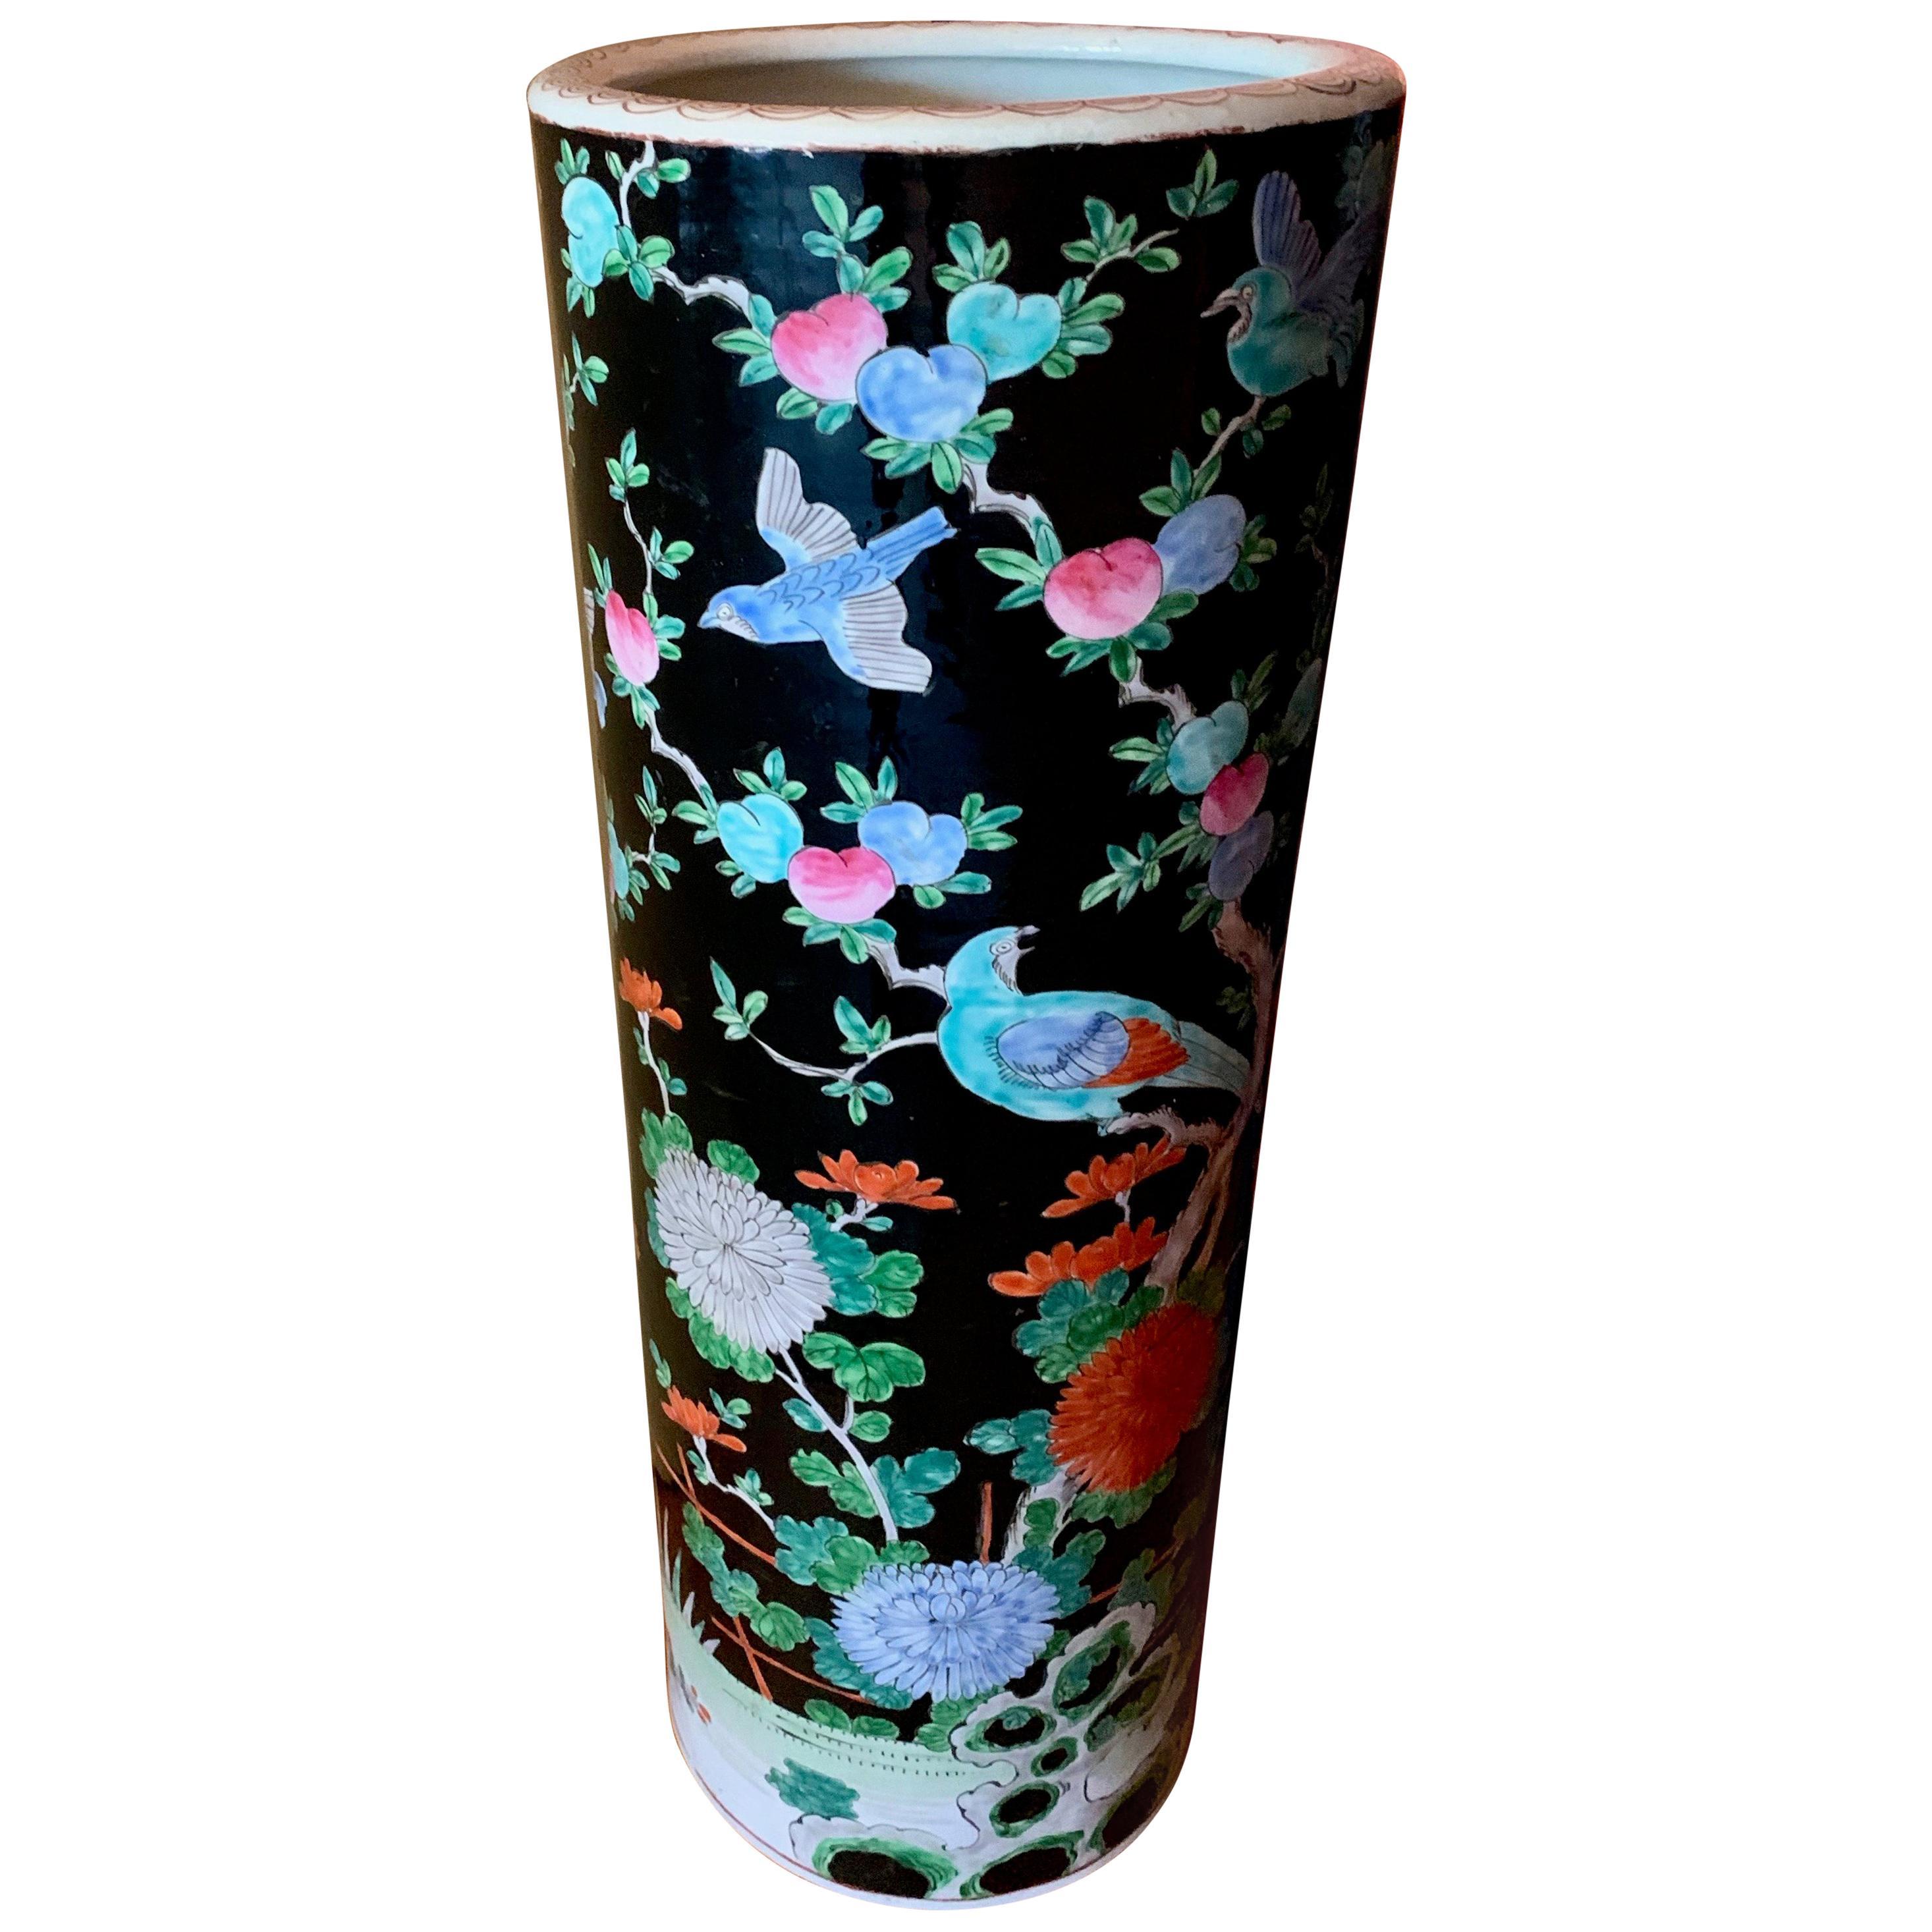 Porcelain Chinese Umbrella Stand Vase